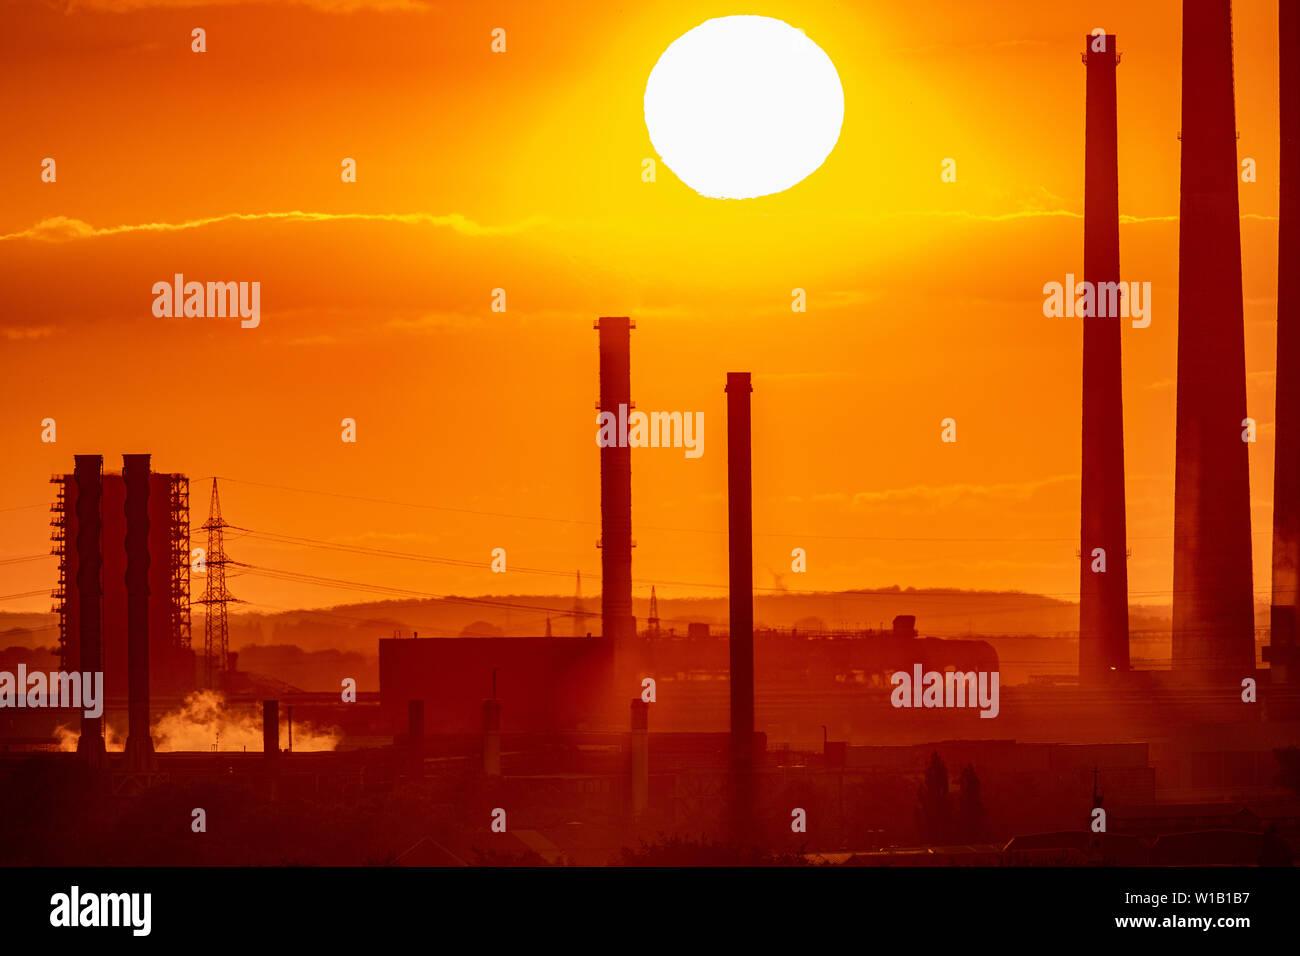 Sonnenuntergang im Ruhrgebiet - Stock Image